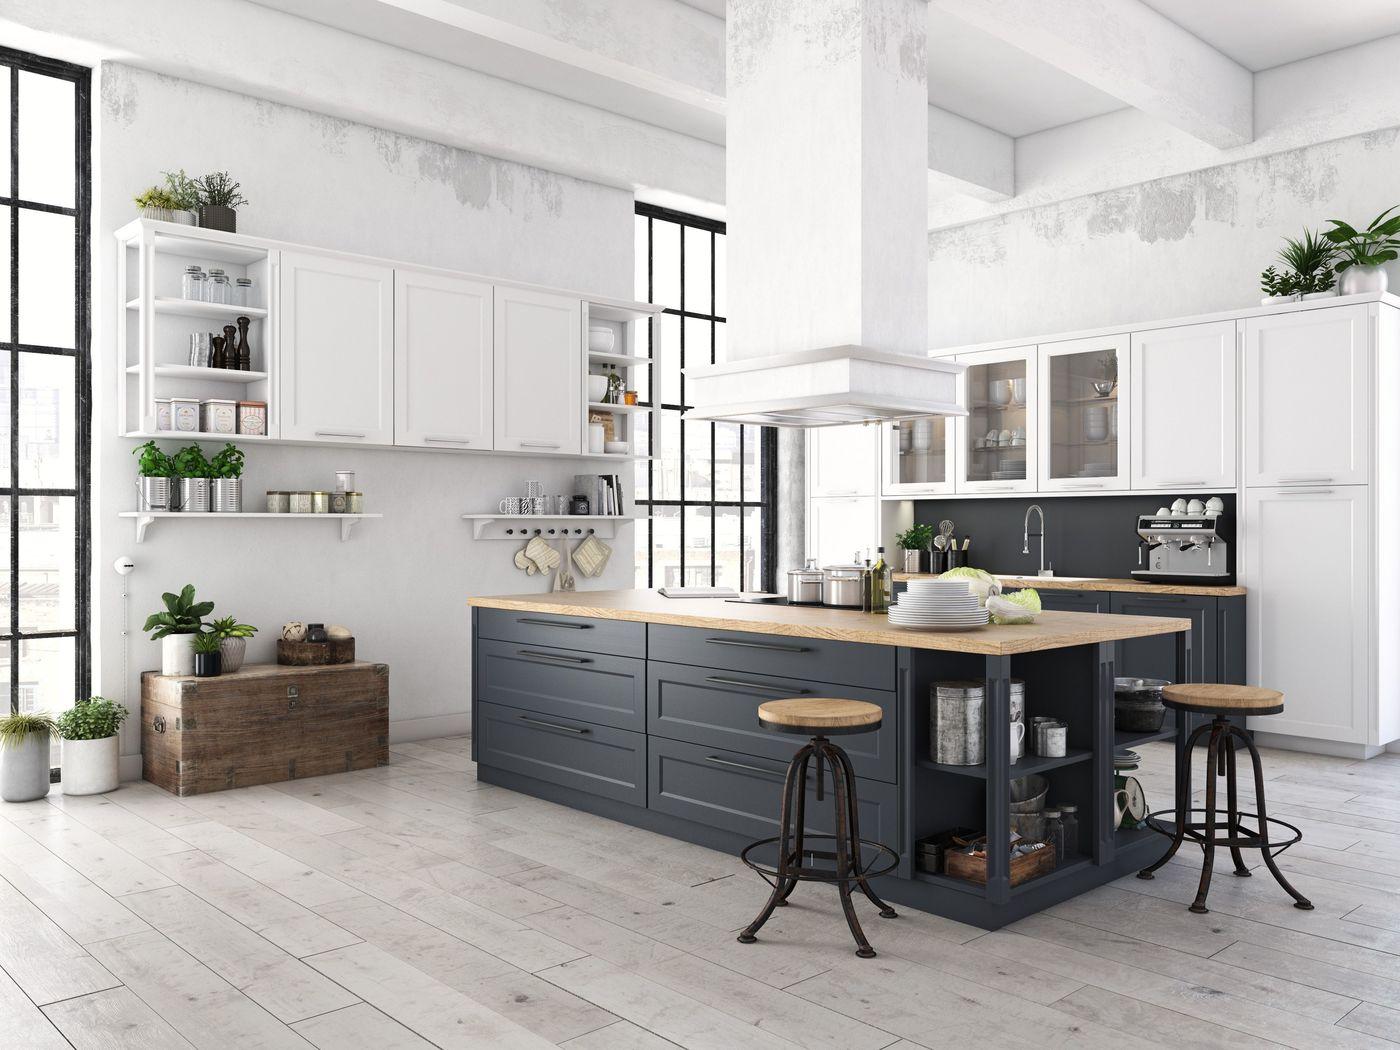 6 arine - Aziende cucine italiane ...